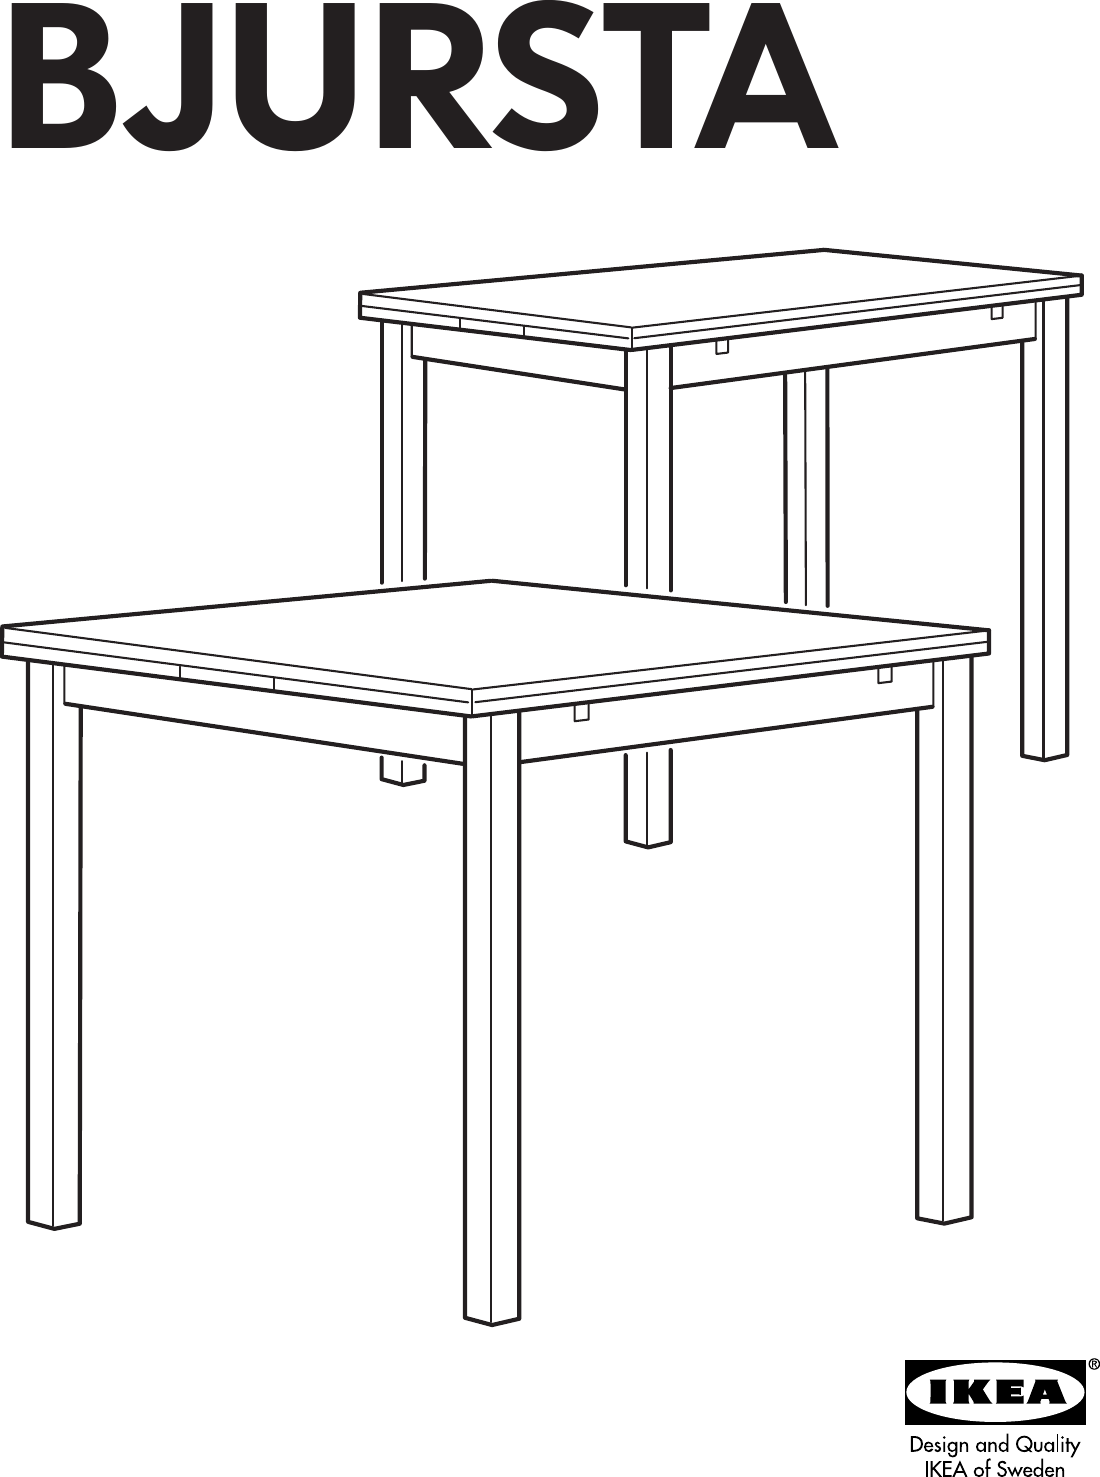 Ikea Bjursta Extendable Dining Table 20 28 35 X35 Assembly Instruction